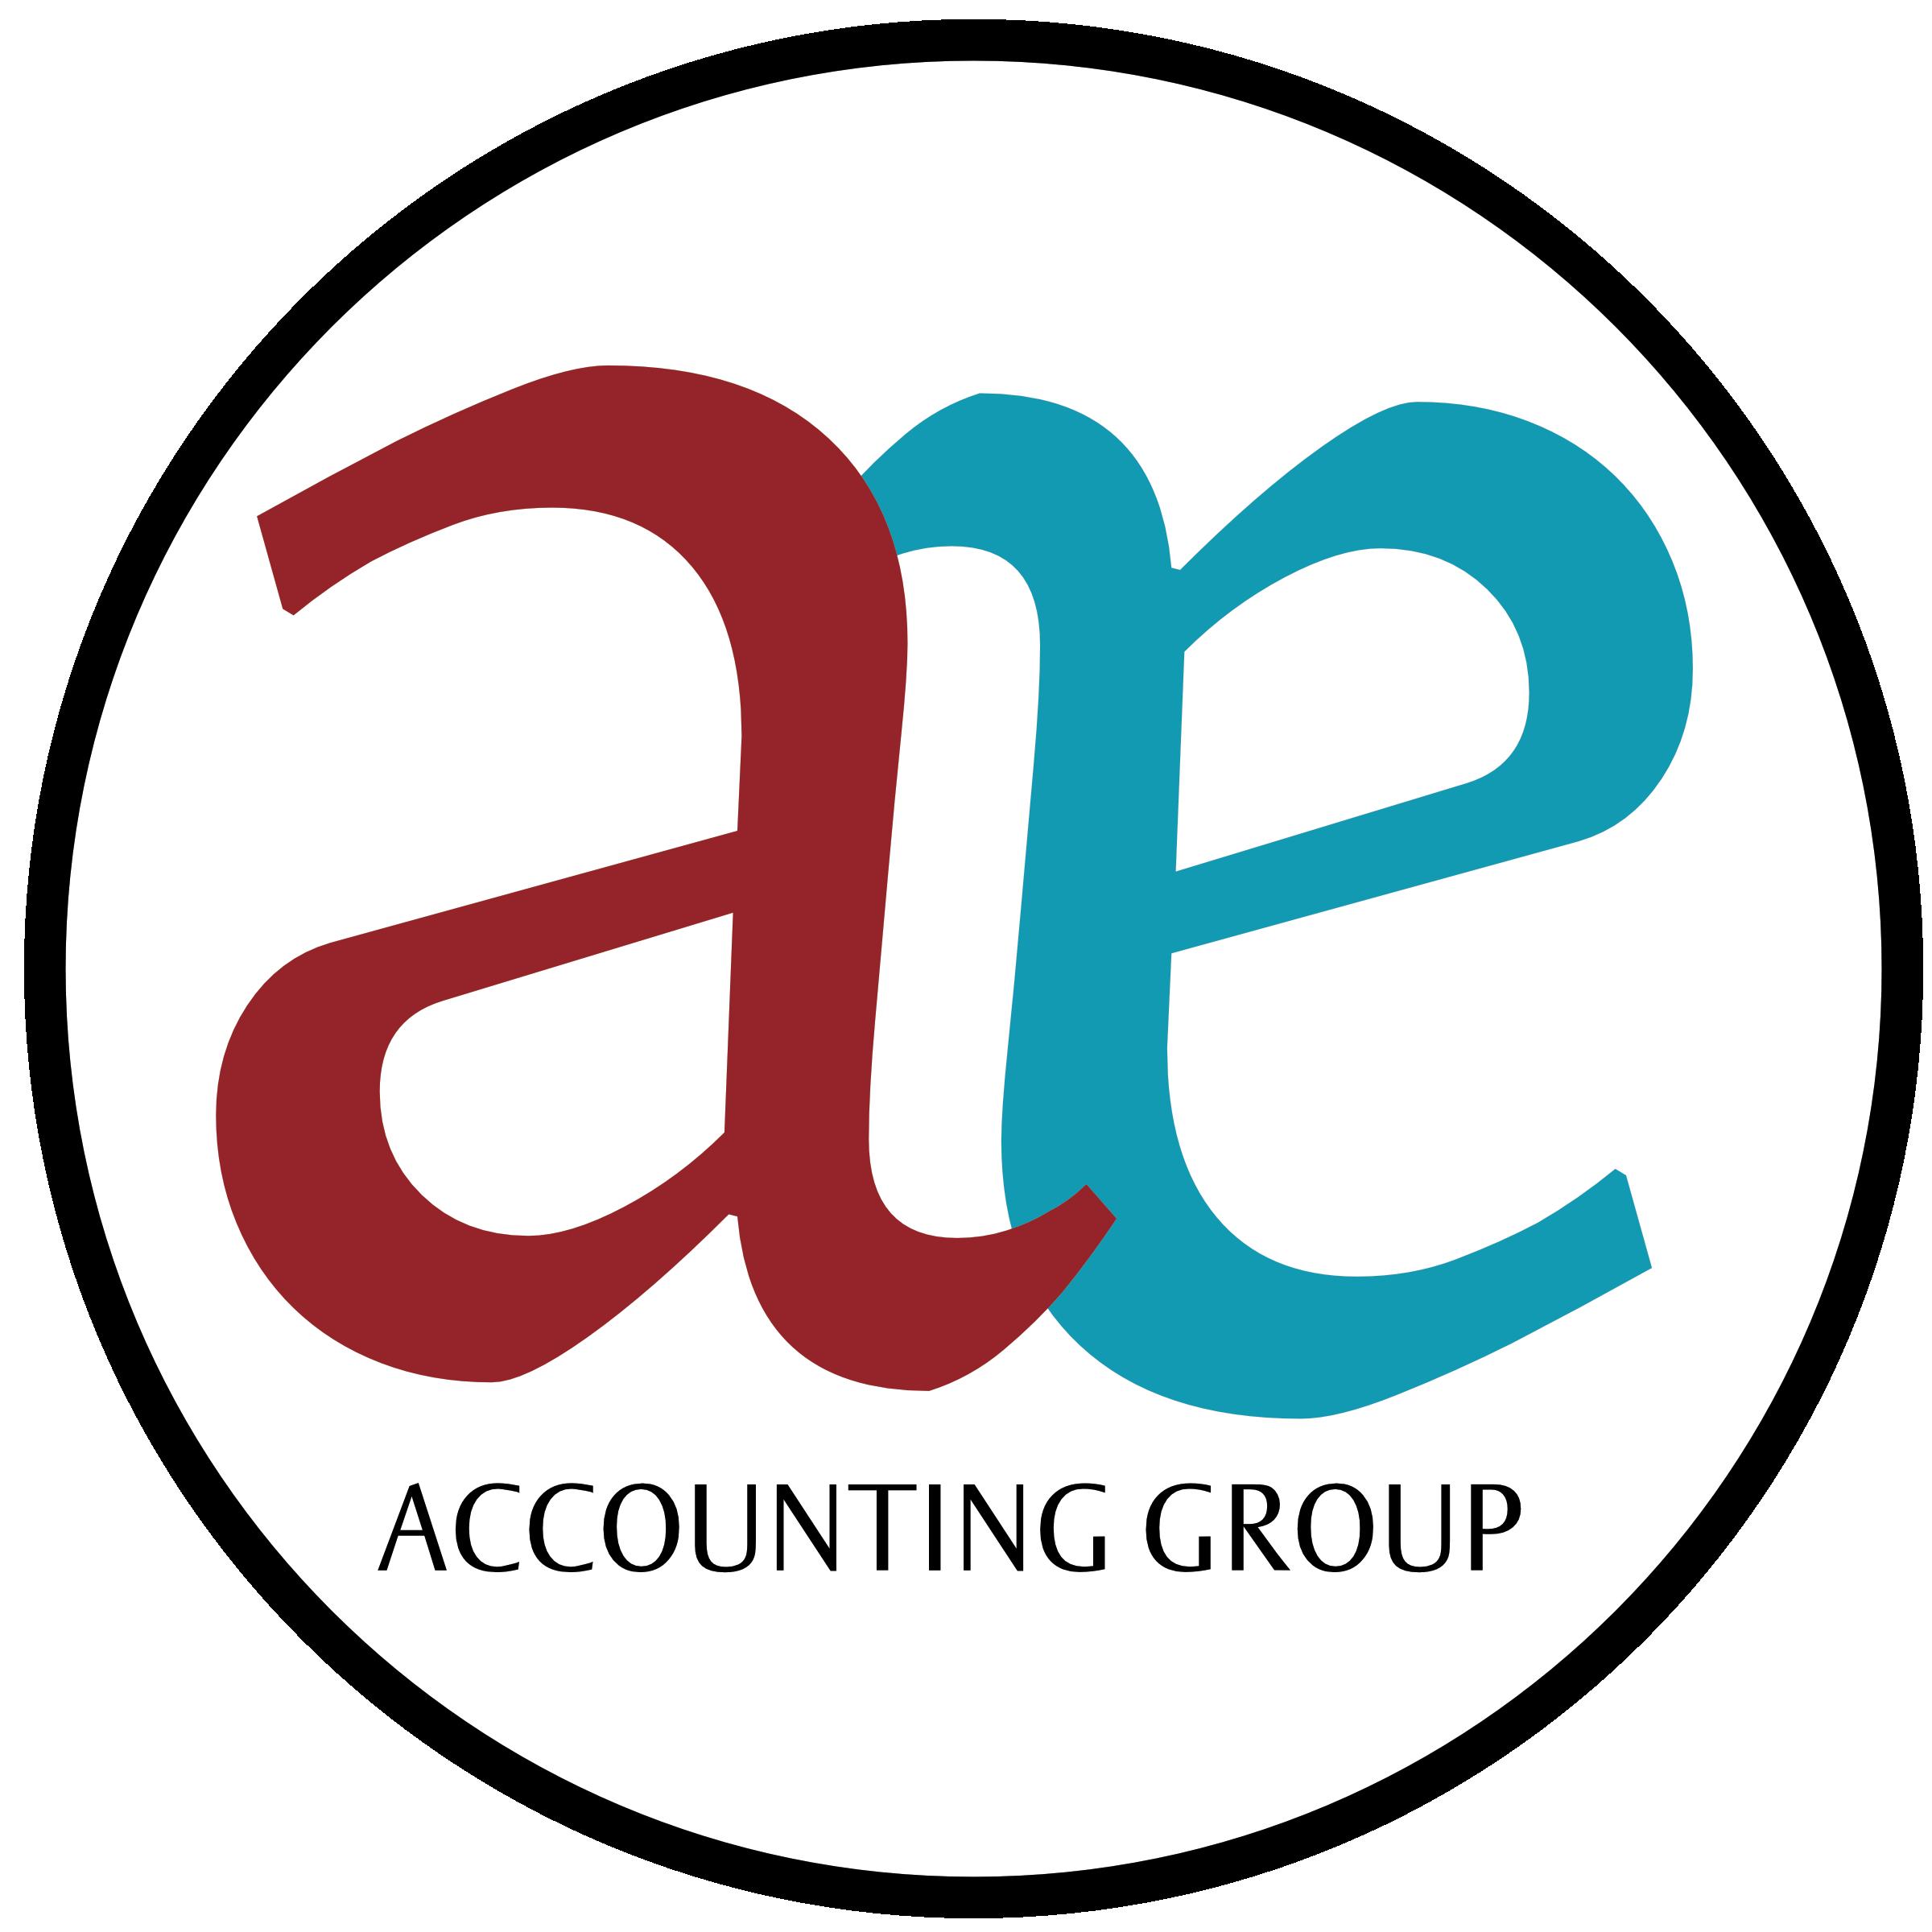 A&E ACCOUNTING GROUP, LLC